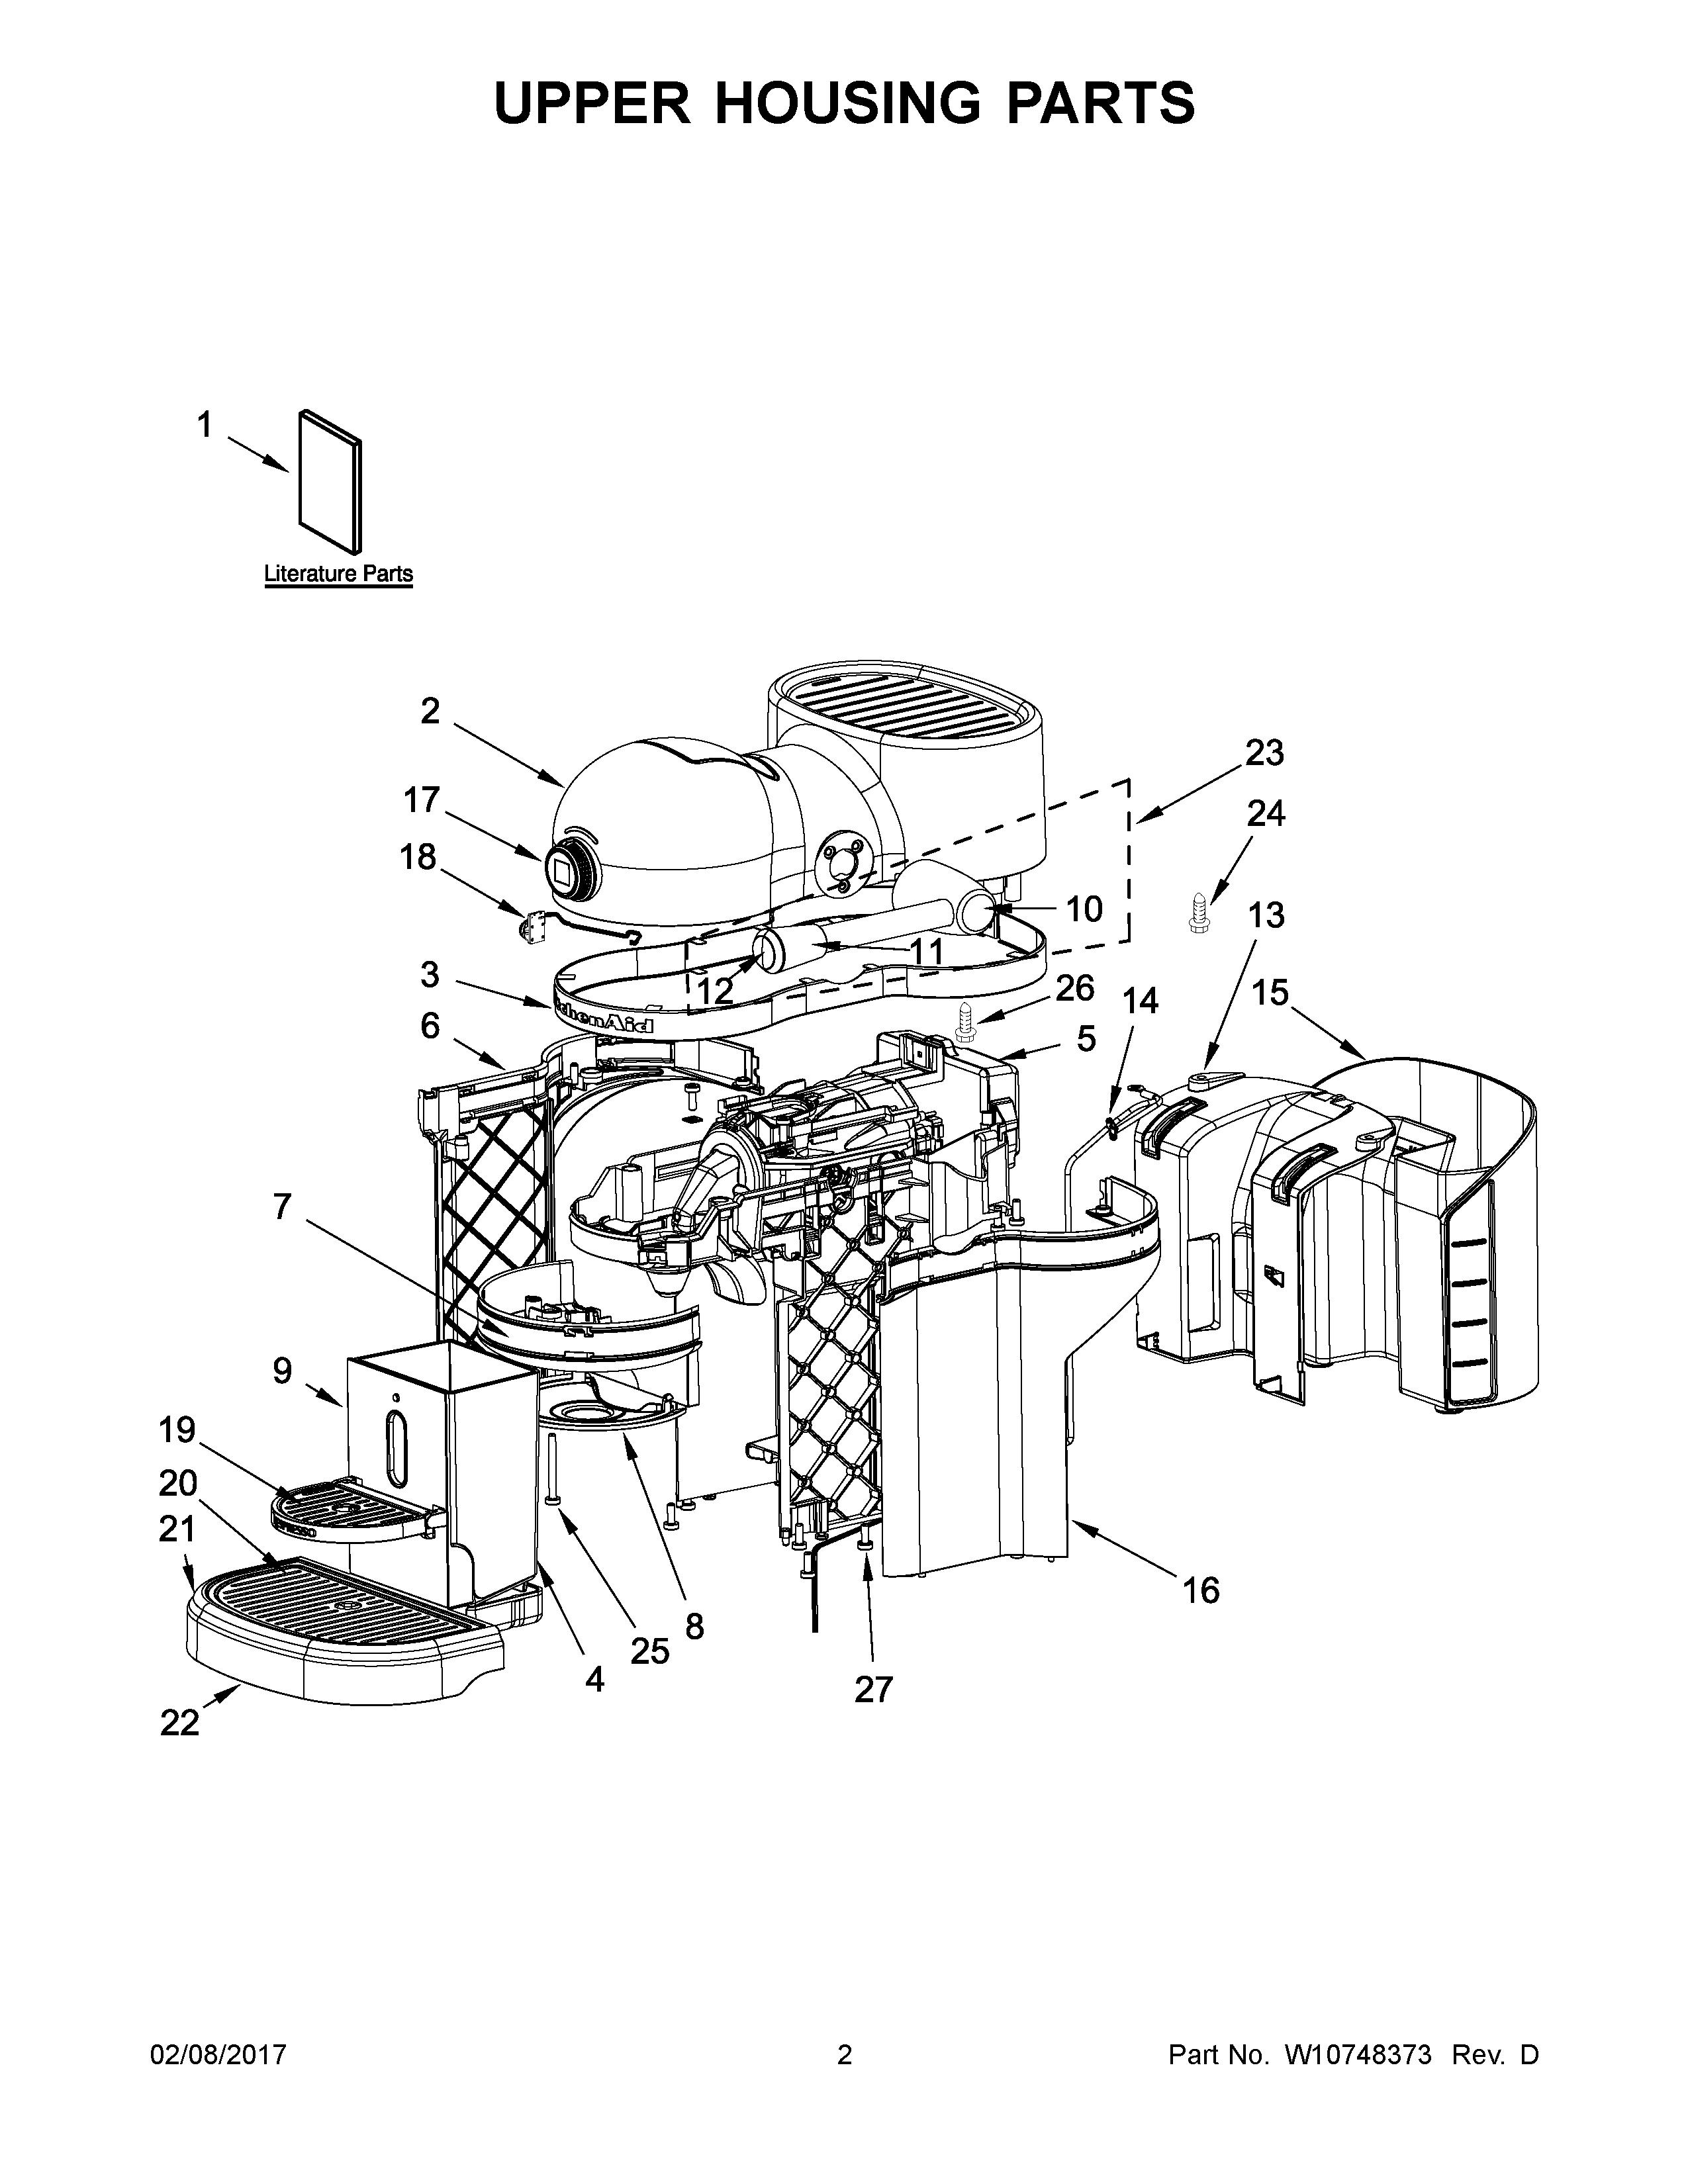 Plans et pièces pour Whirlpool Small Appliance, Coffee